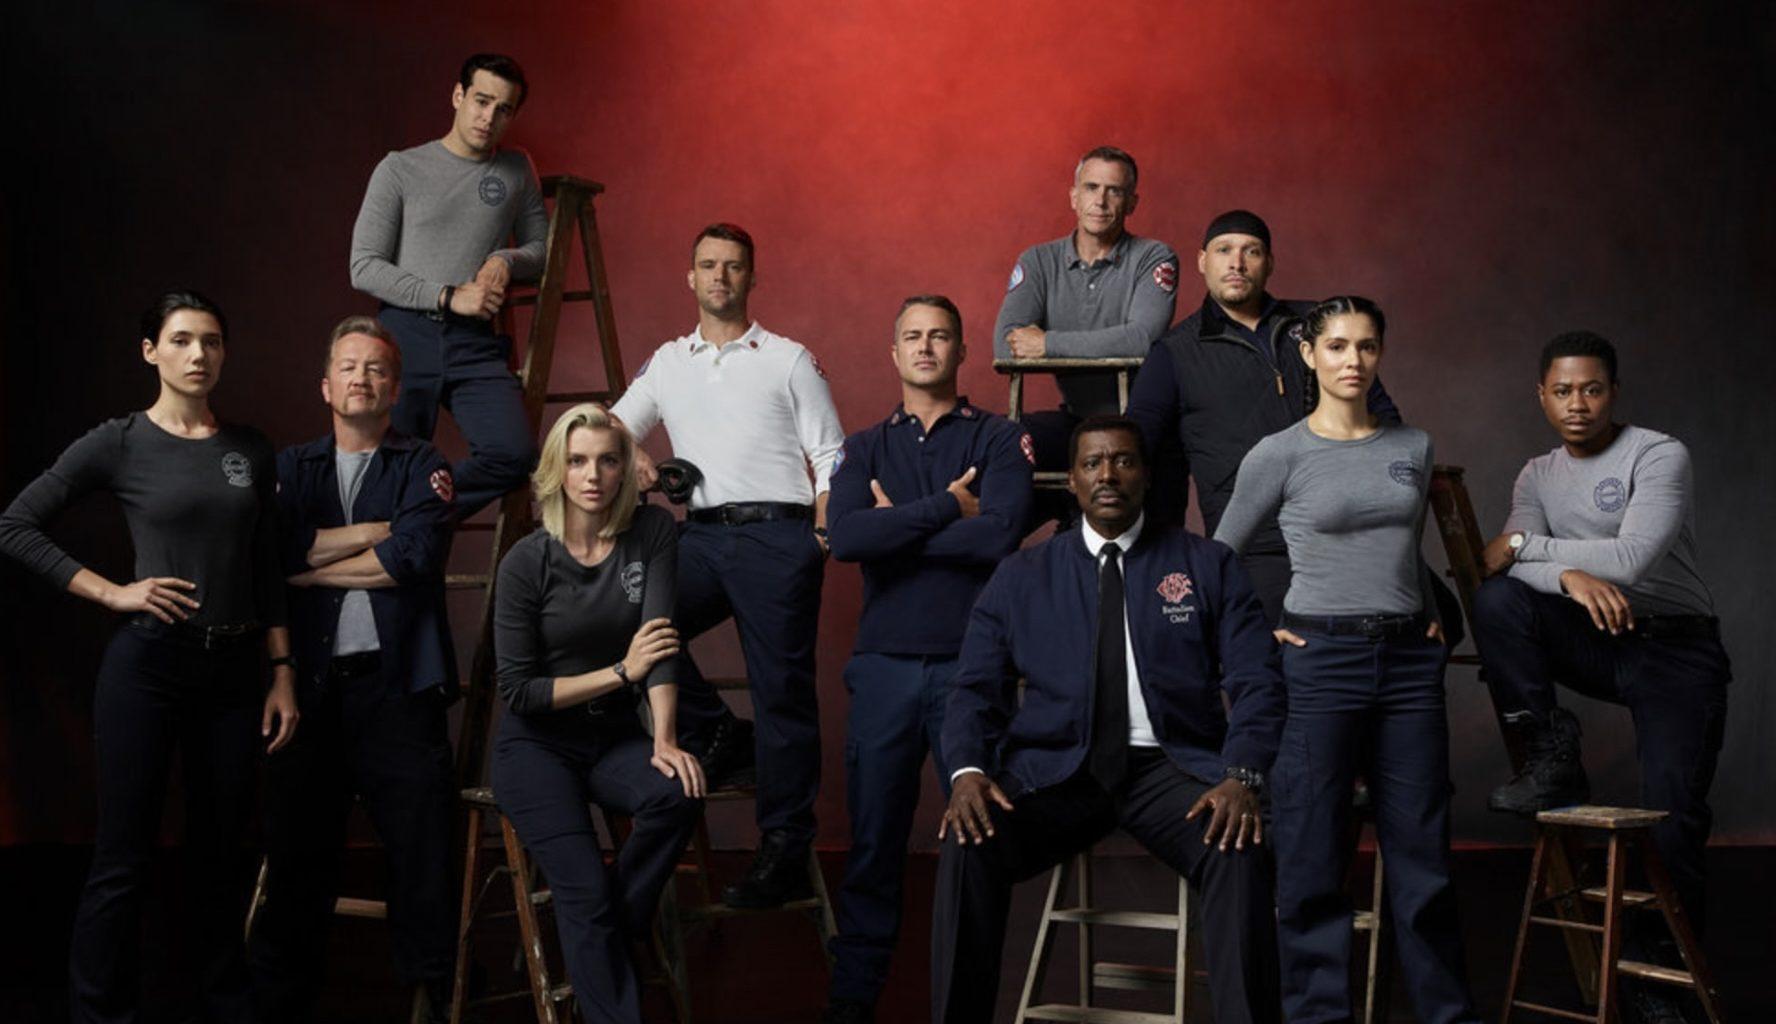 Chicago Fire Season 10 Episode 3 Release Date